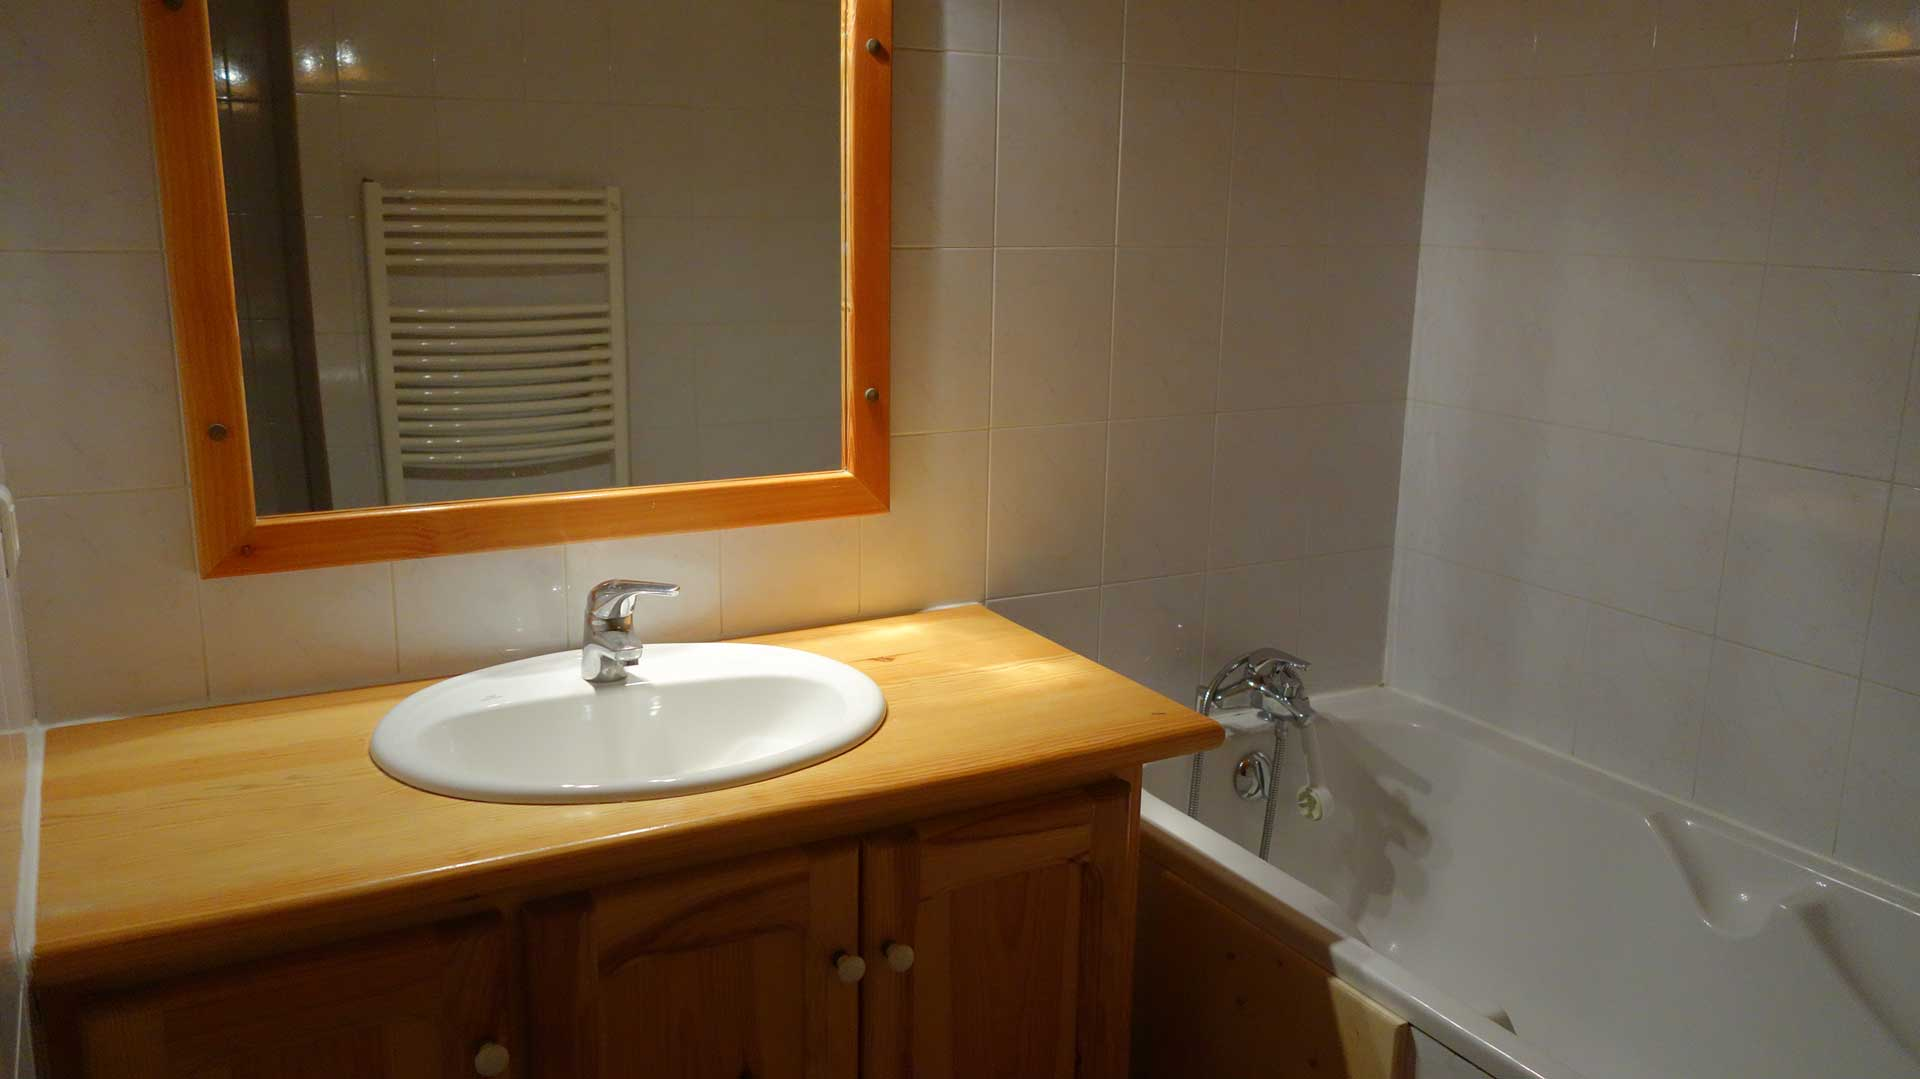 Marmotte - Salle de bain, 1er étage